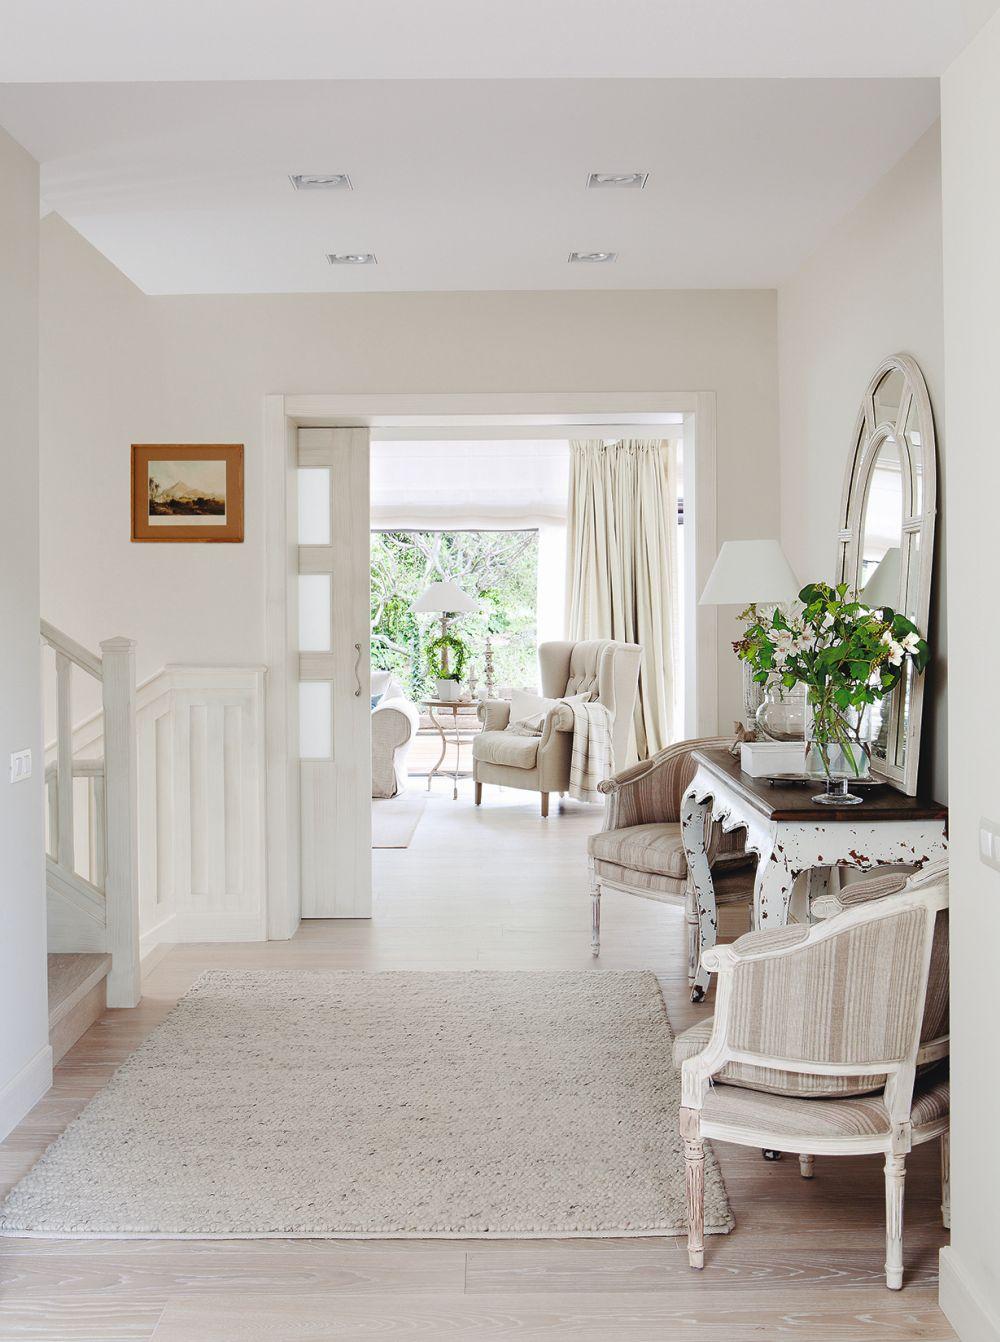 adelaparvu.com despre casa cu interior romantic modern, decorator Asun Anto, arhitect Fernando Agusti (7)